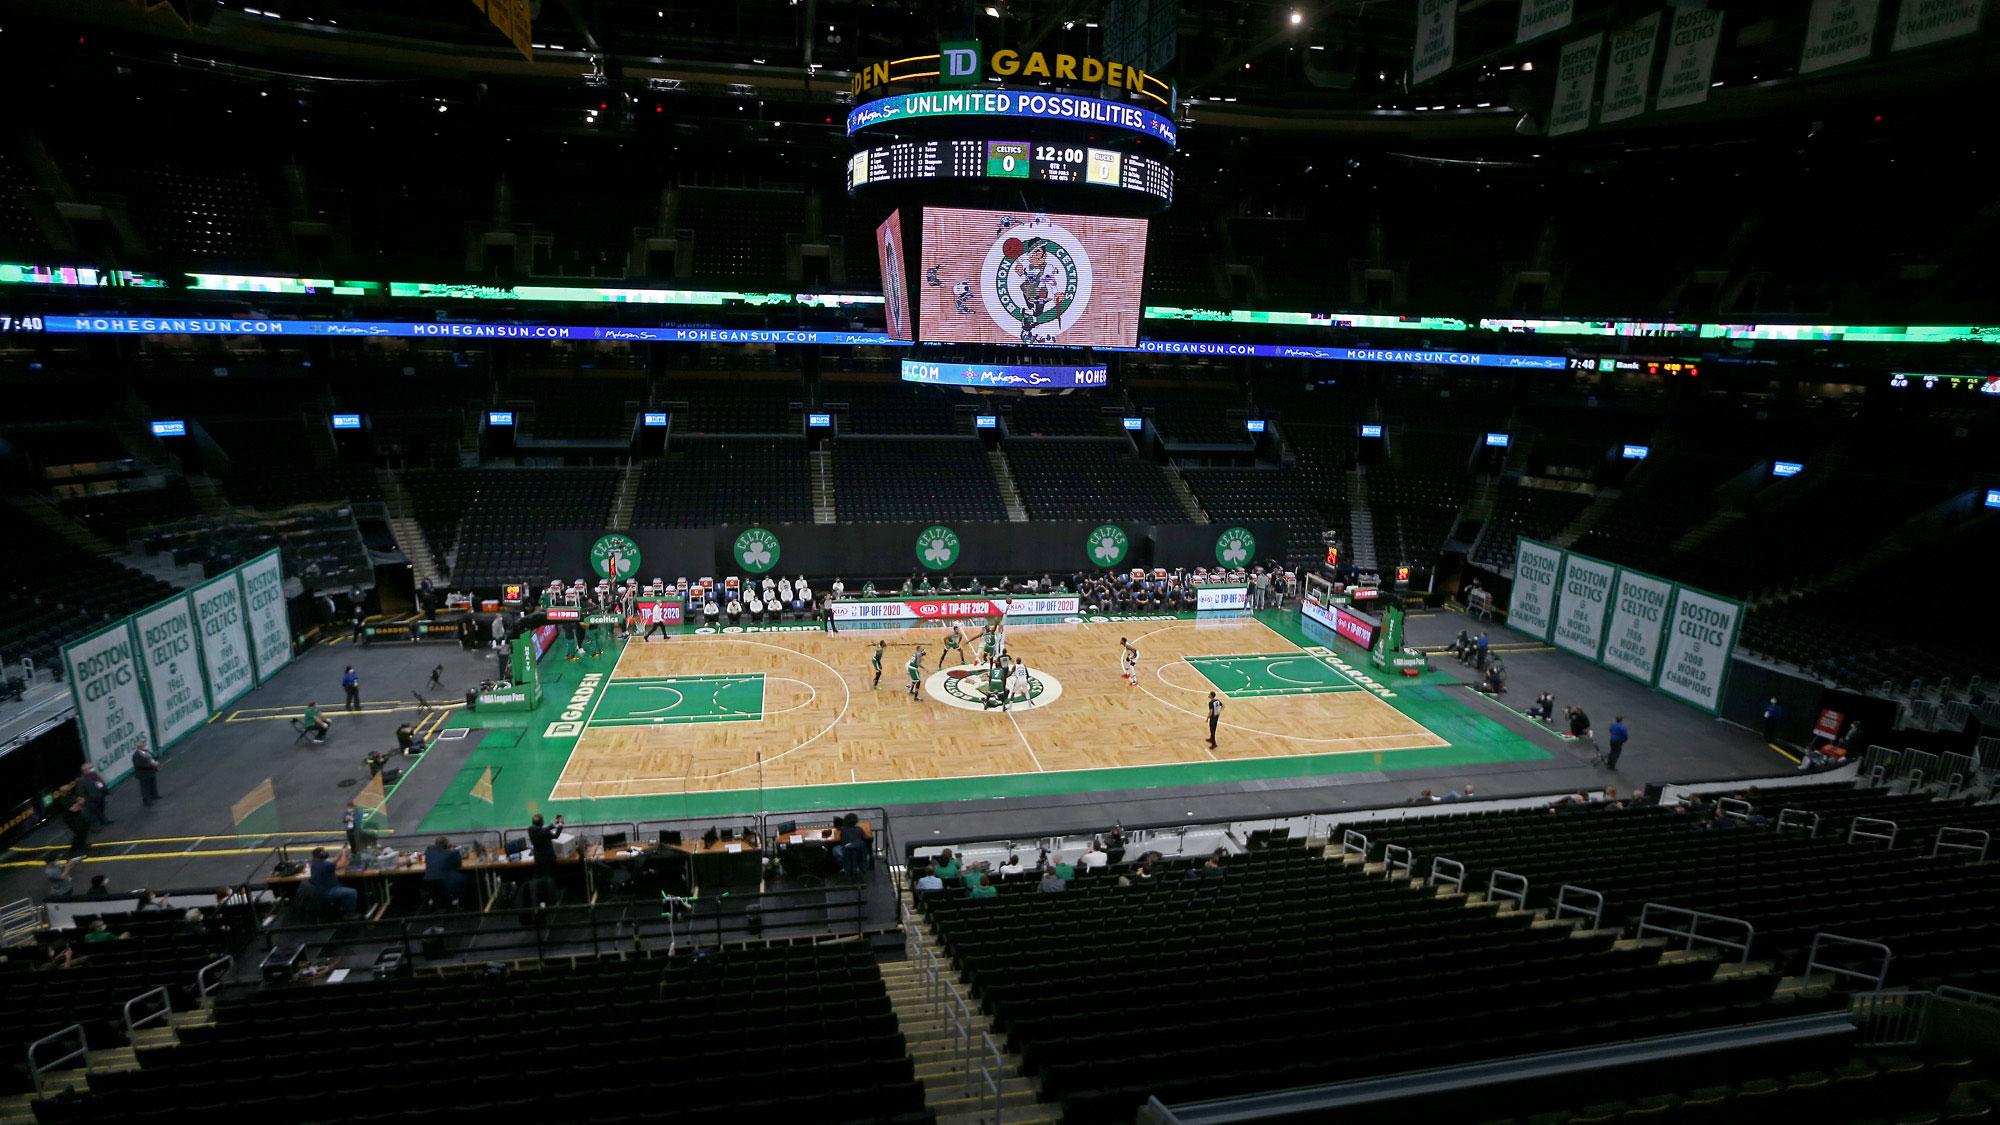 Matt Stone/MediaNews Group/Boston Herald/Getty Images